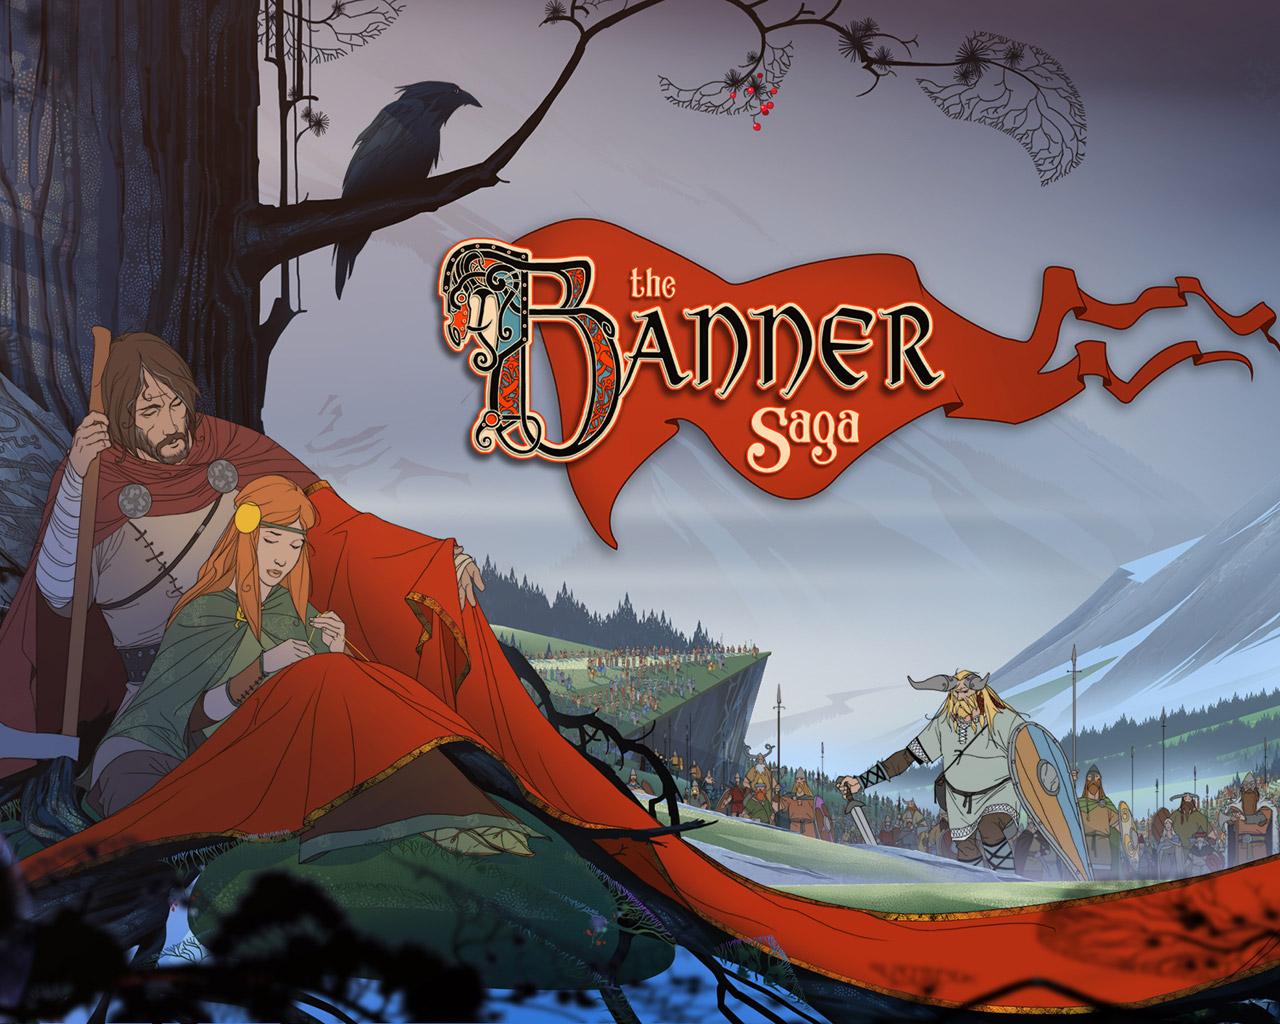 Free The Banner Saga Wallpaper in 1280x1024